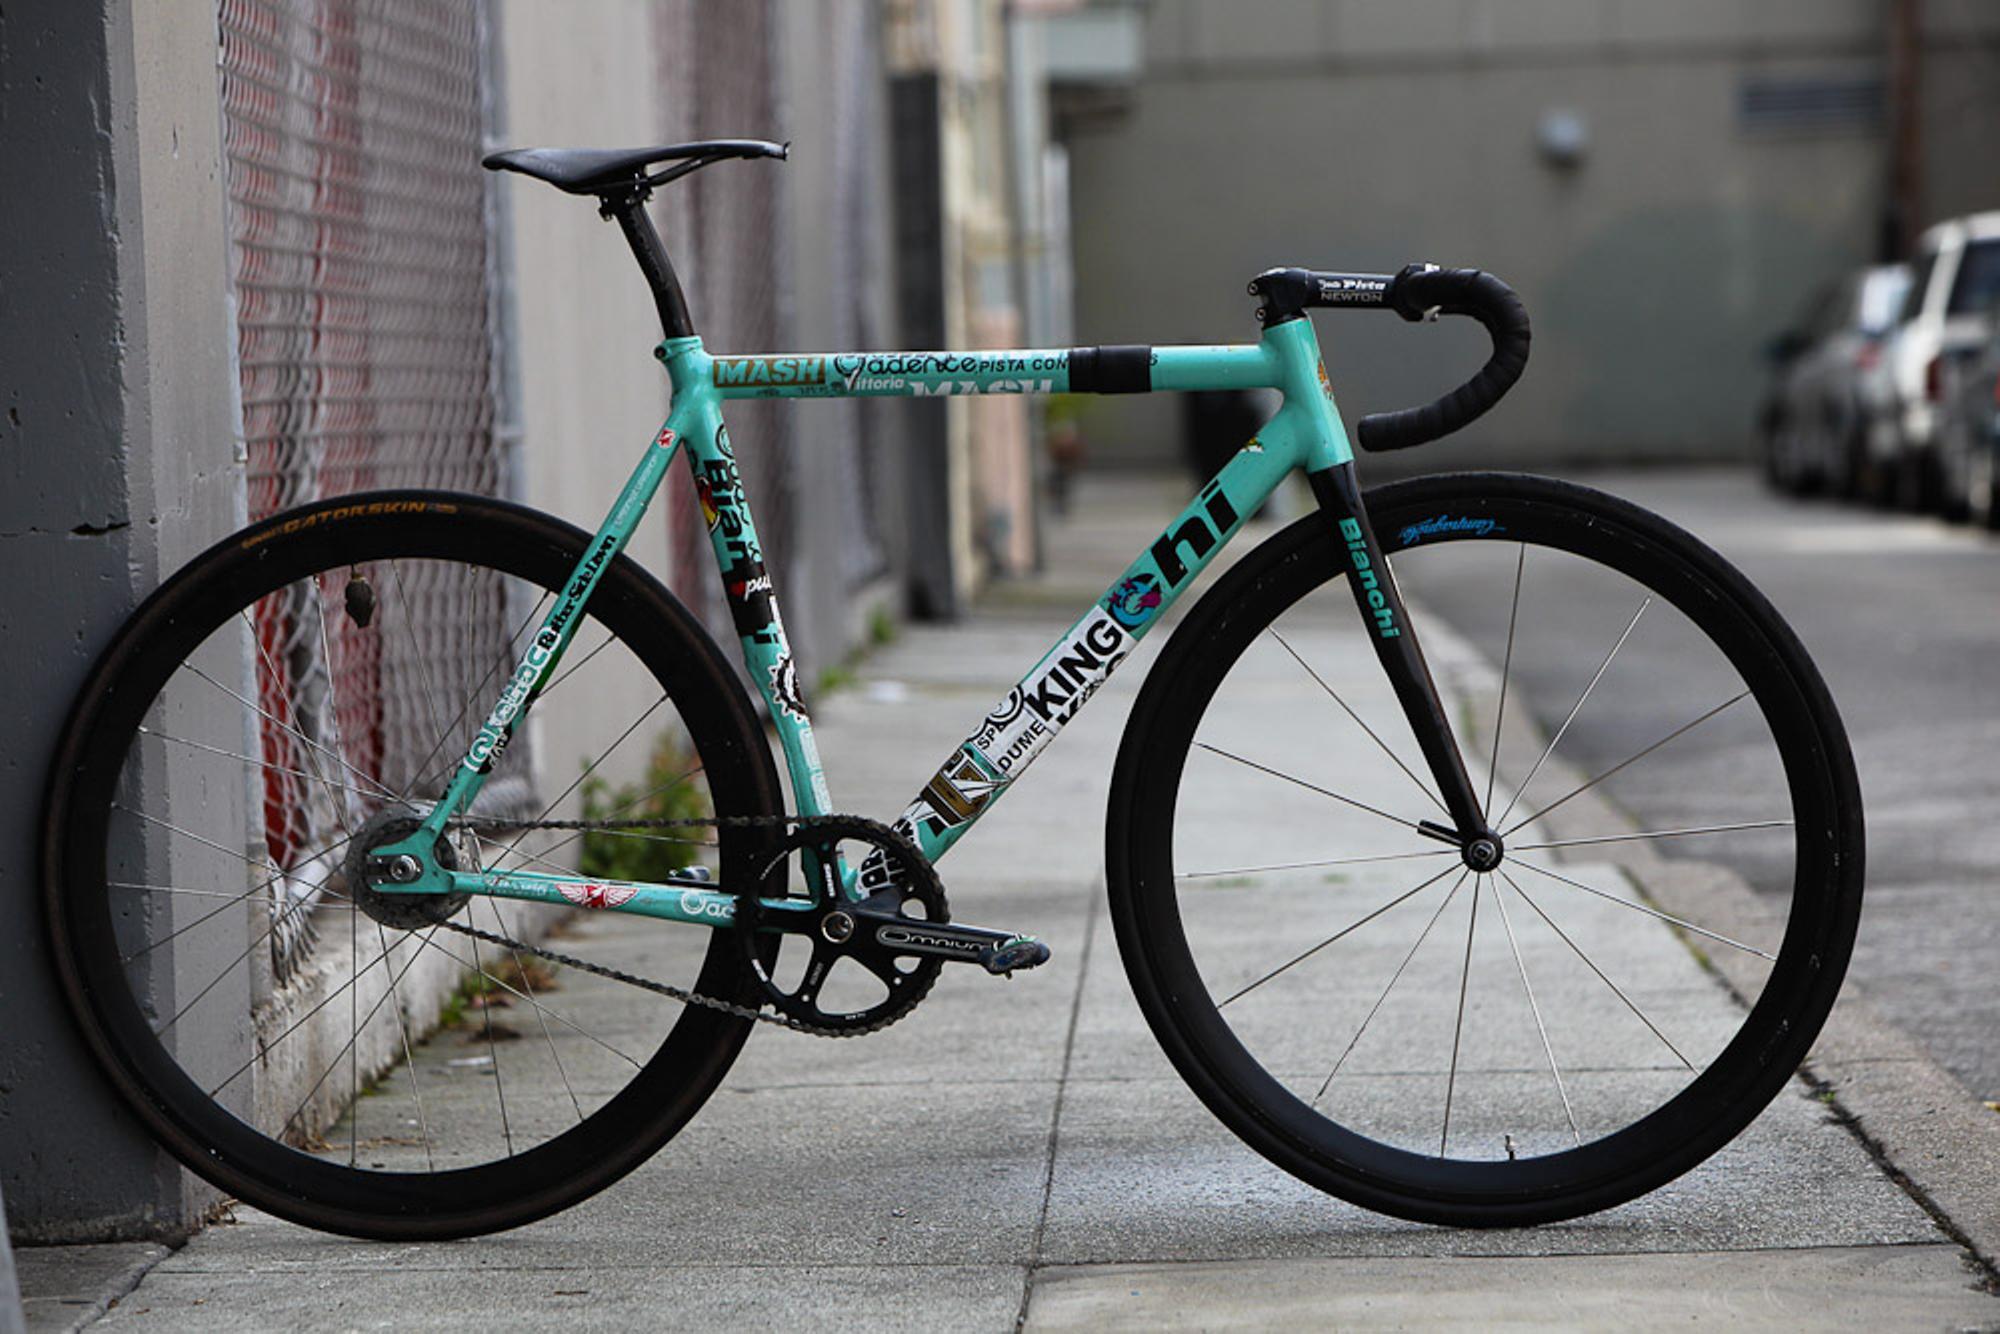 Rai's Bianchi Concept